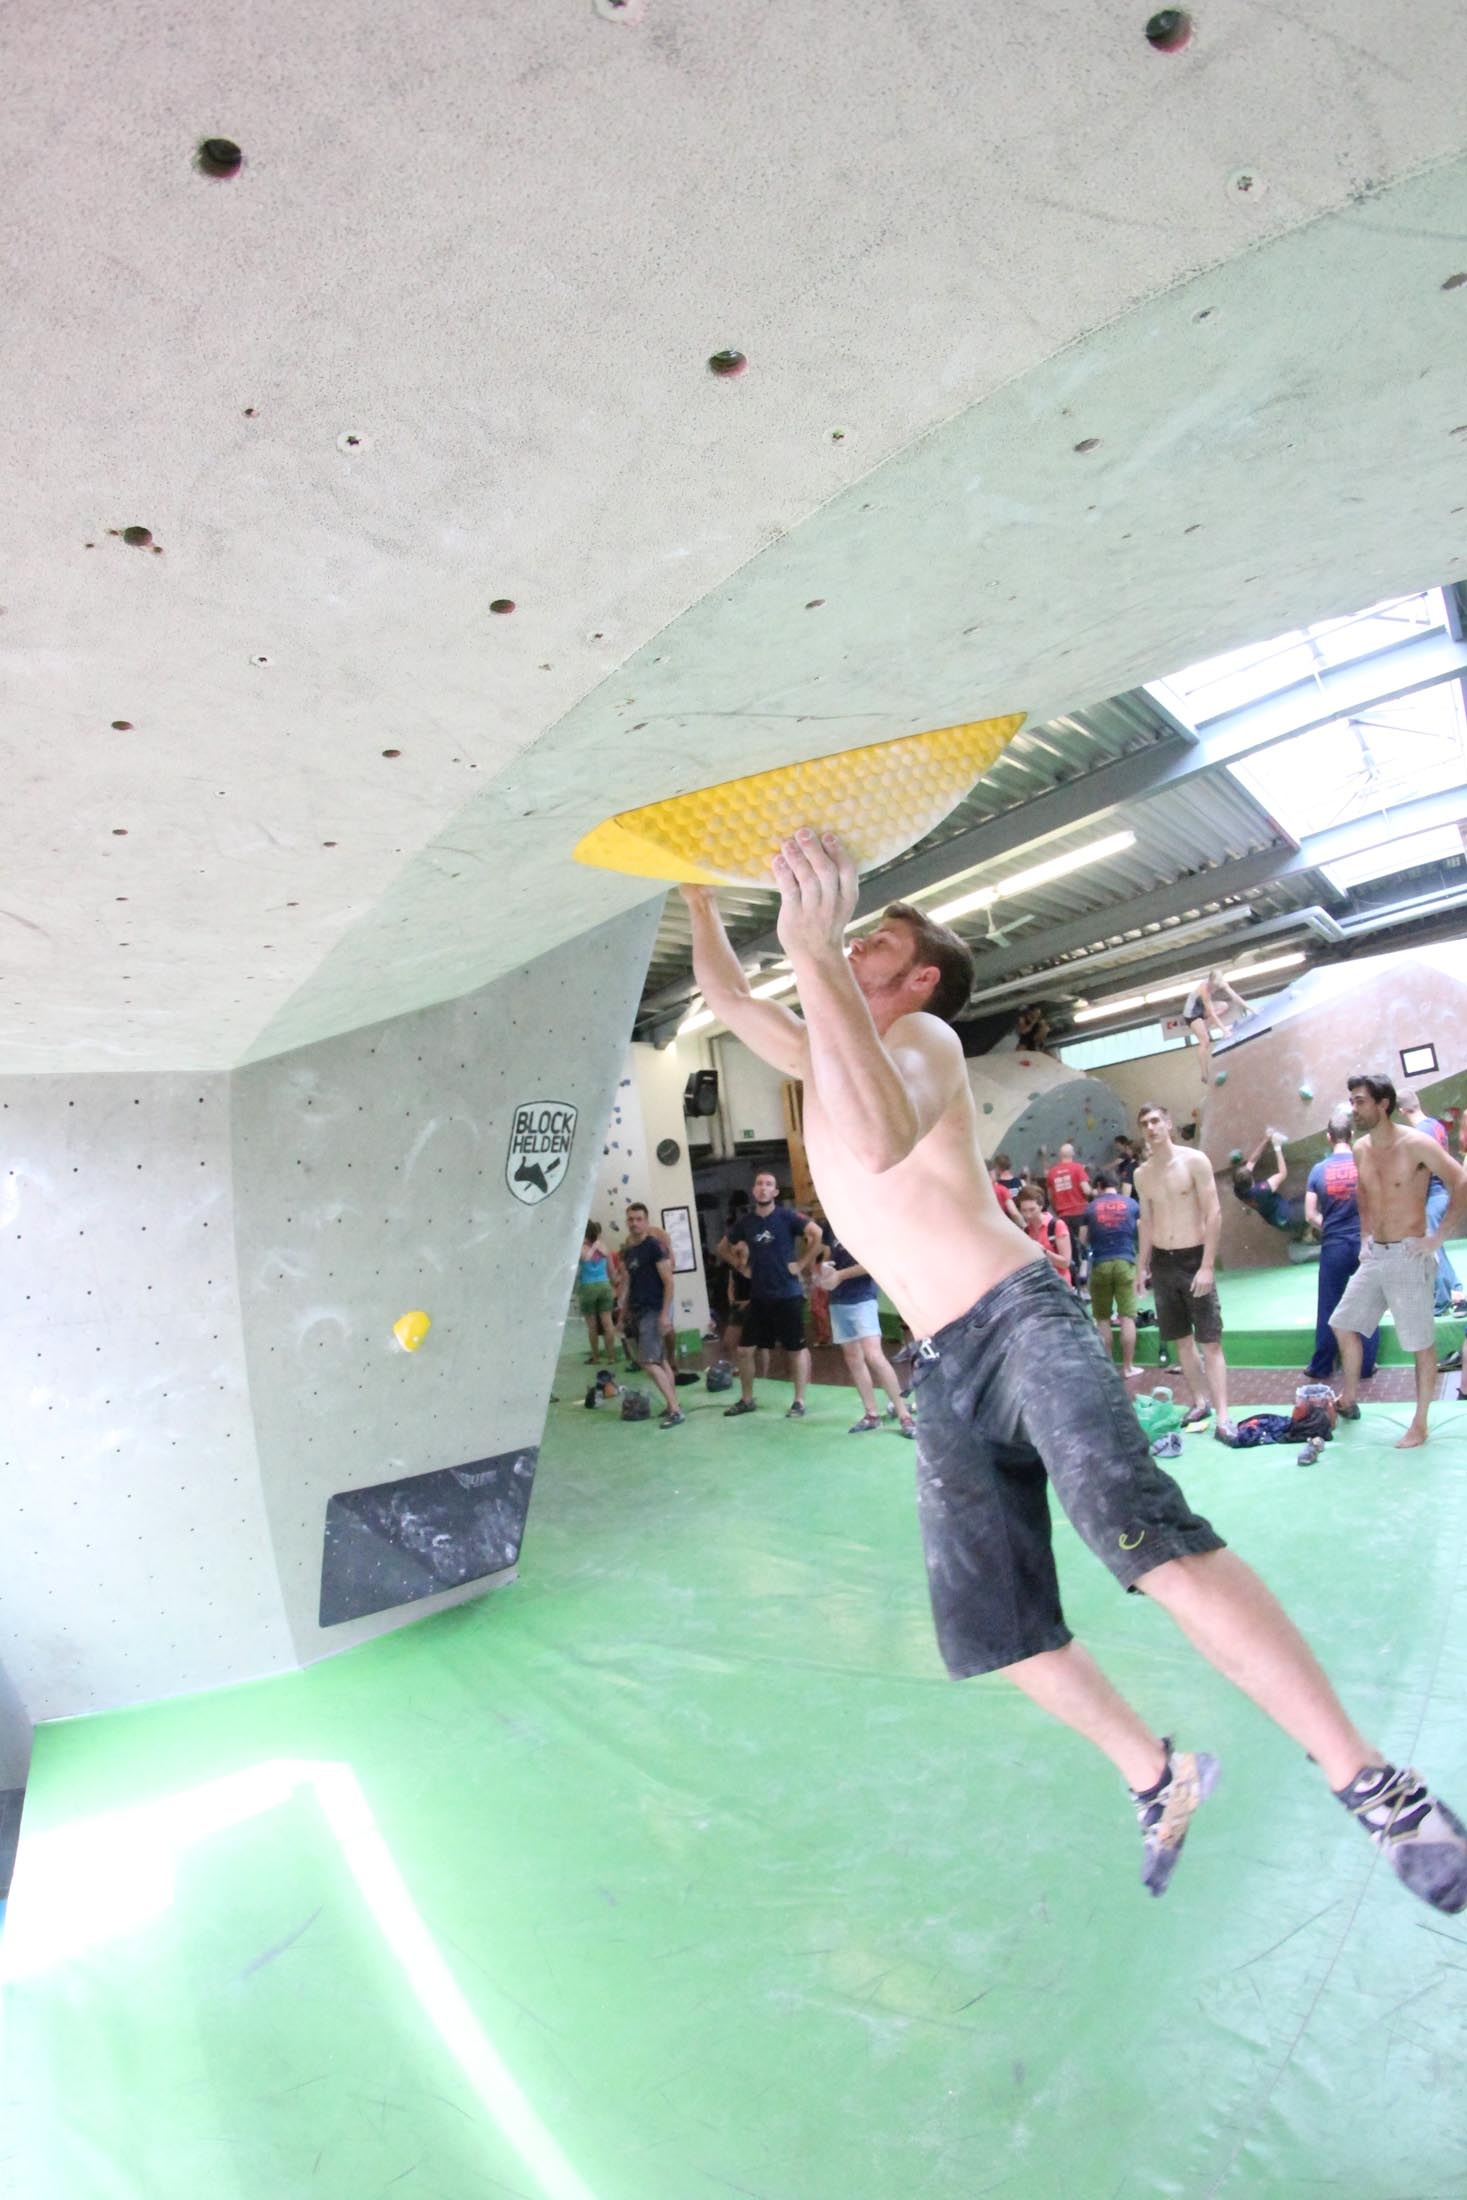 Quali, internationaler bouldercup Frankenjura 2016, BLOCKHELDEN Erlangen, Mammut, Bergfreunde.de, Boulderwettkampf07092016156